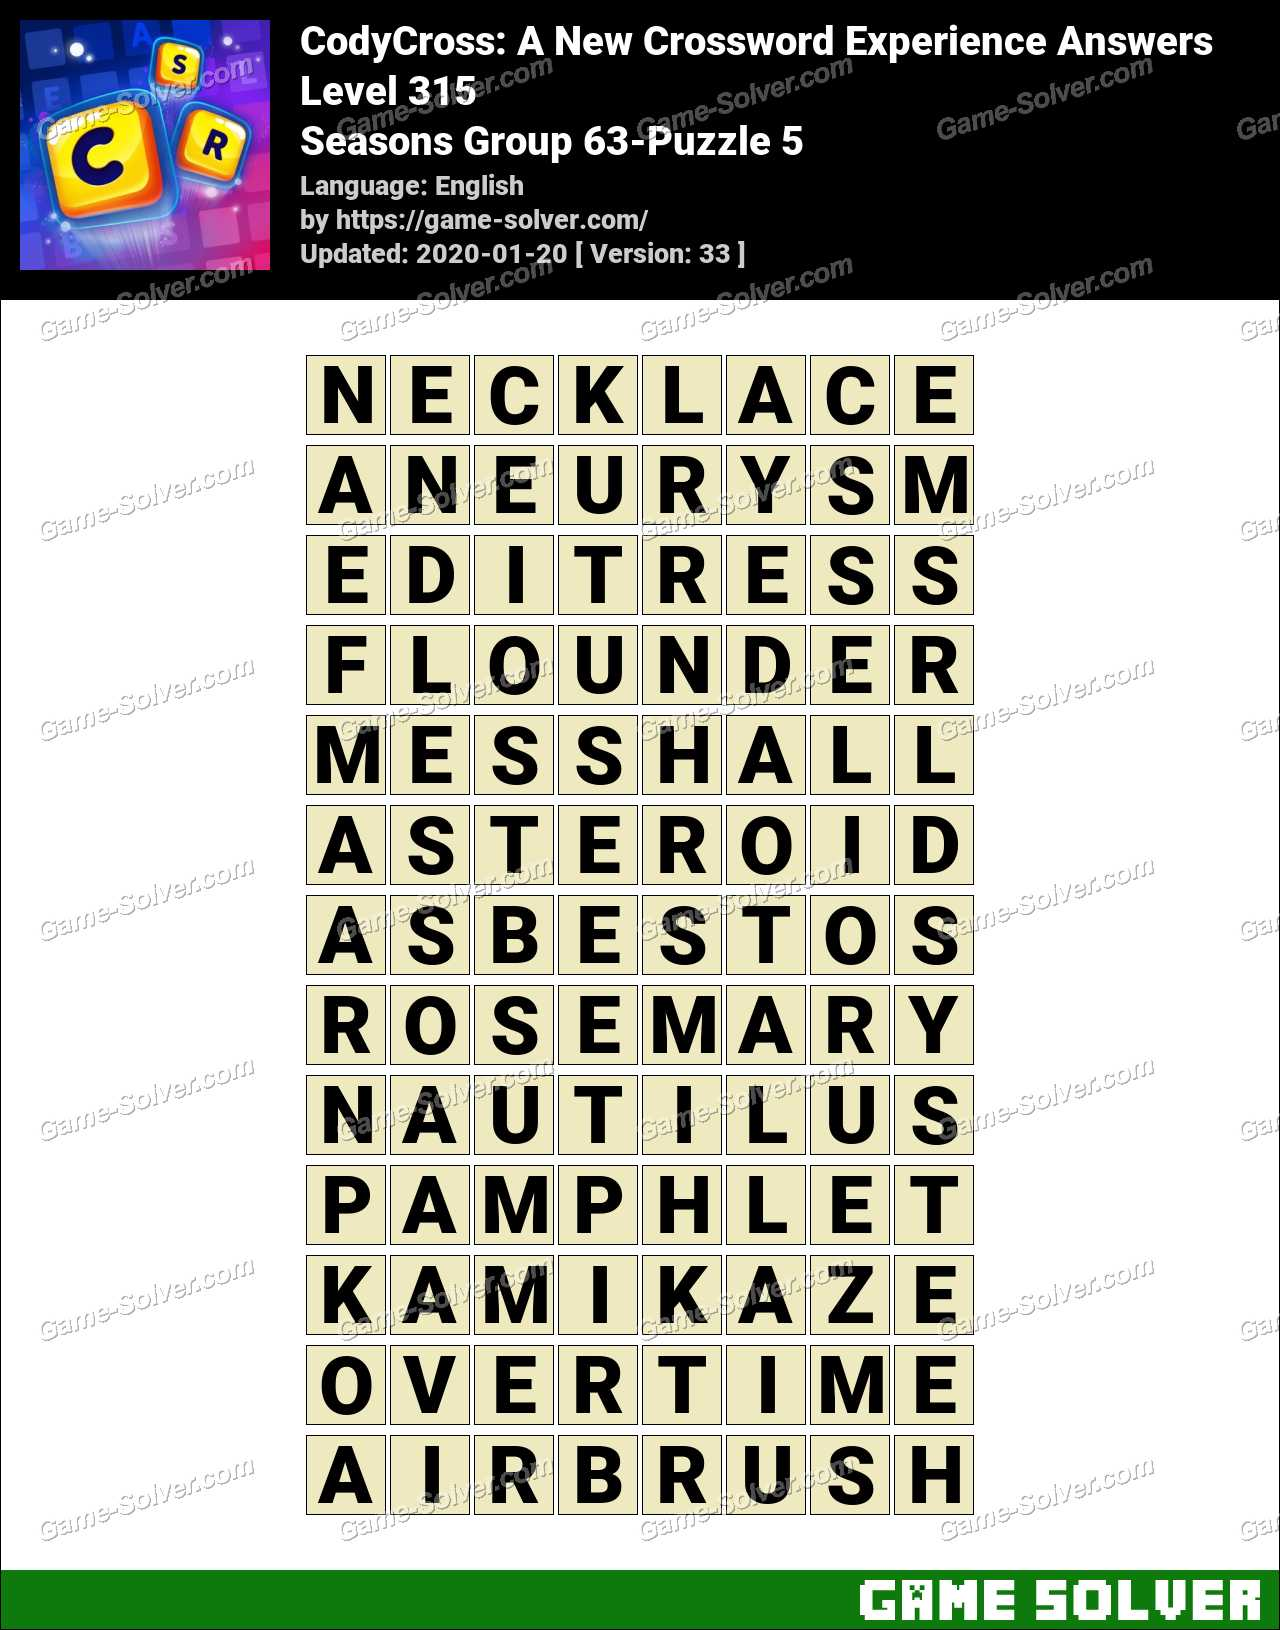 CodyCross Seasons Group 63-Puzzle 5 Answers